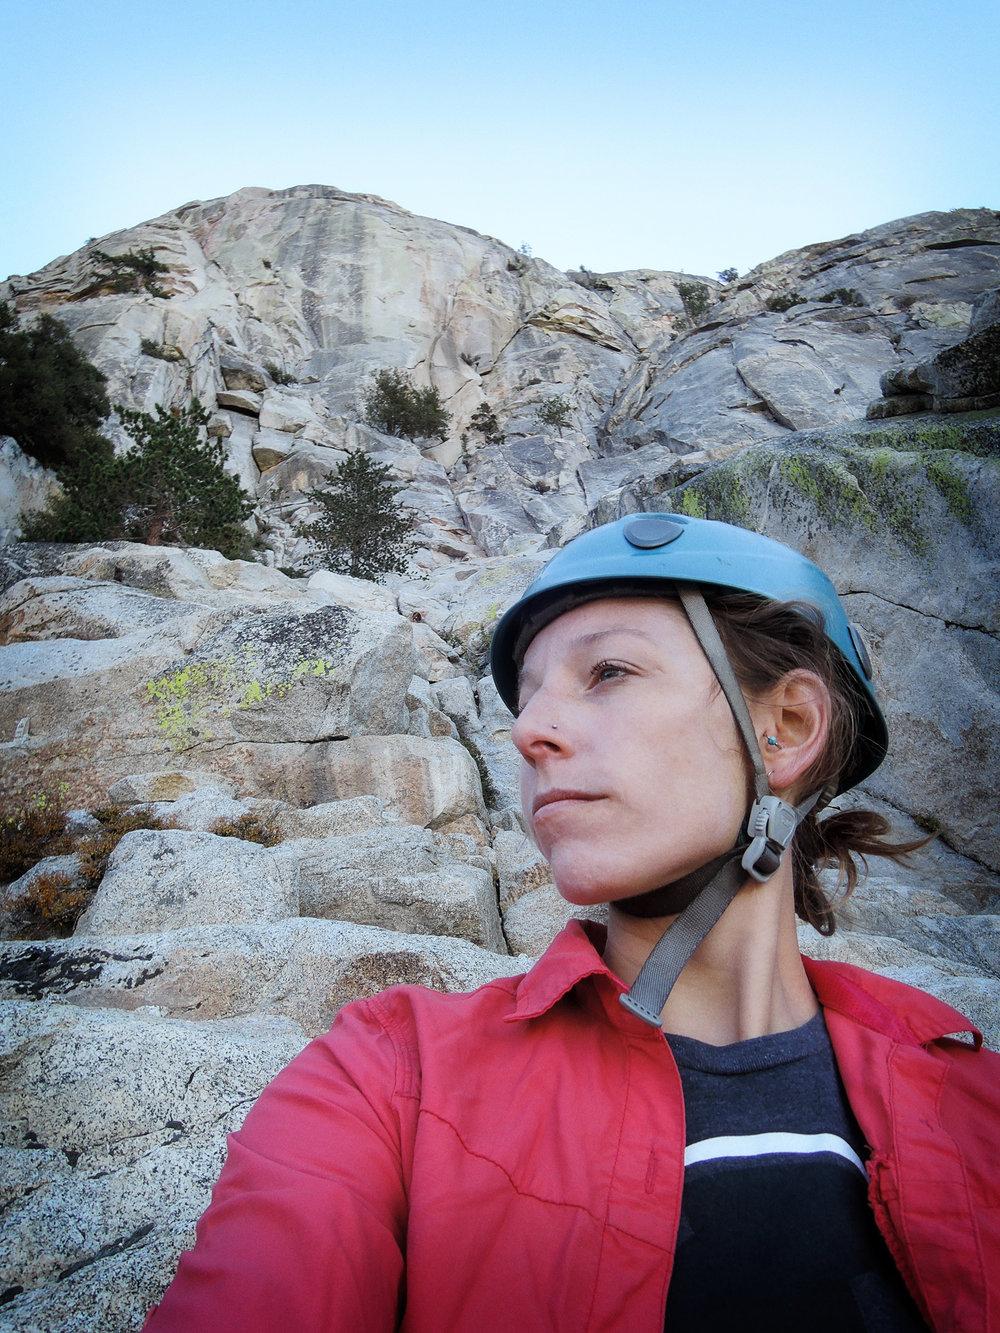 Climbing Idyllwild